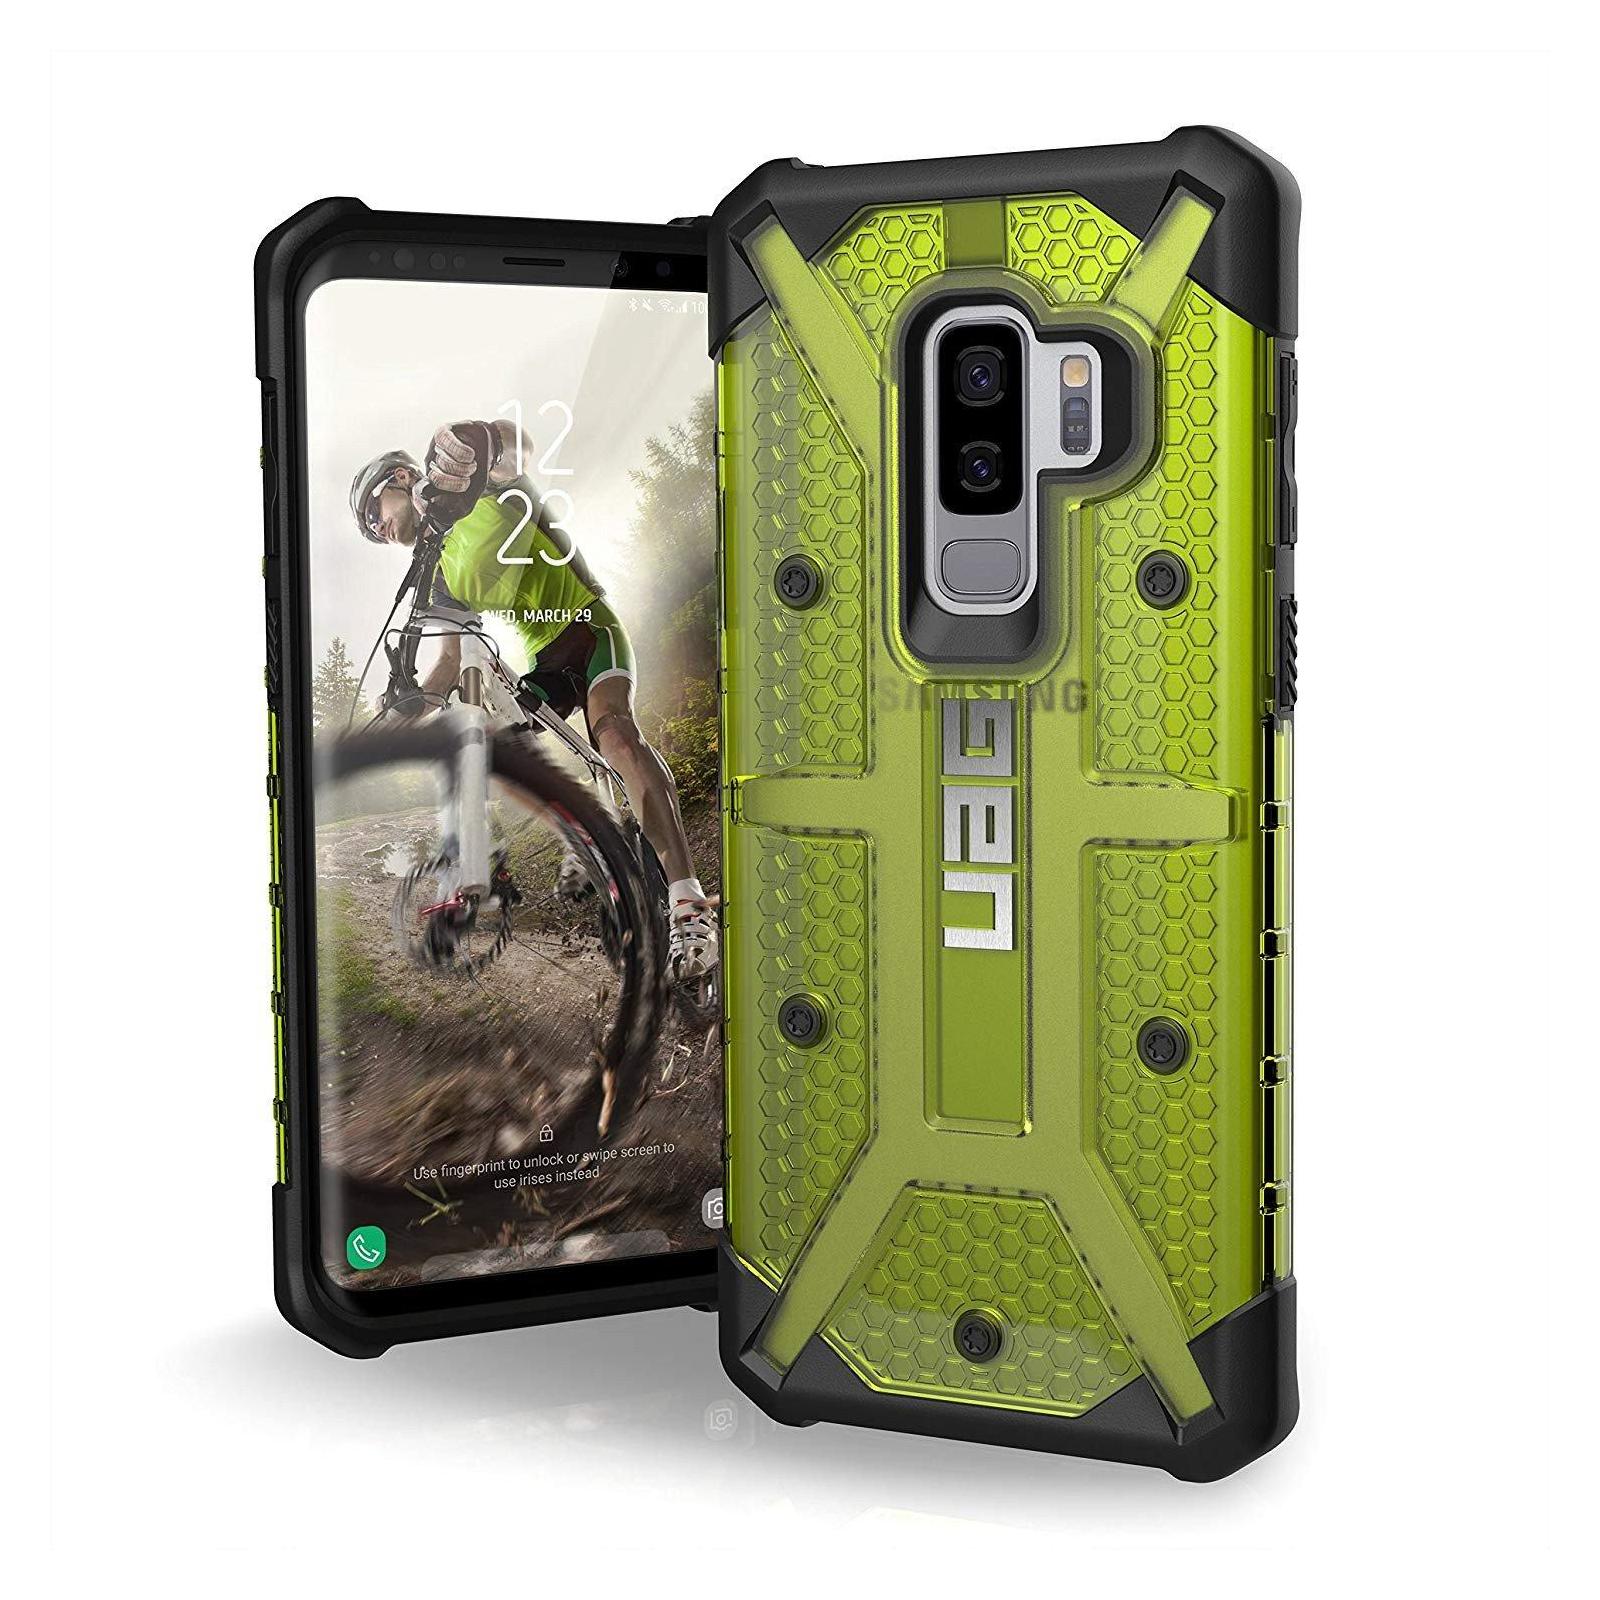 Чехол для моб. телефона Urban Armor Gear Galaxy S9+ Plasma Citron (GLXS9PLS-L-CT) изображение 6